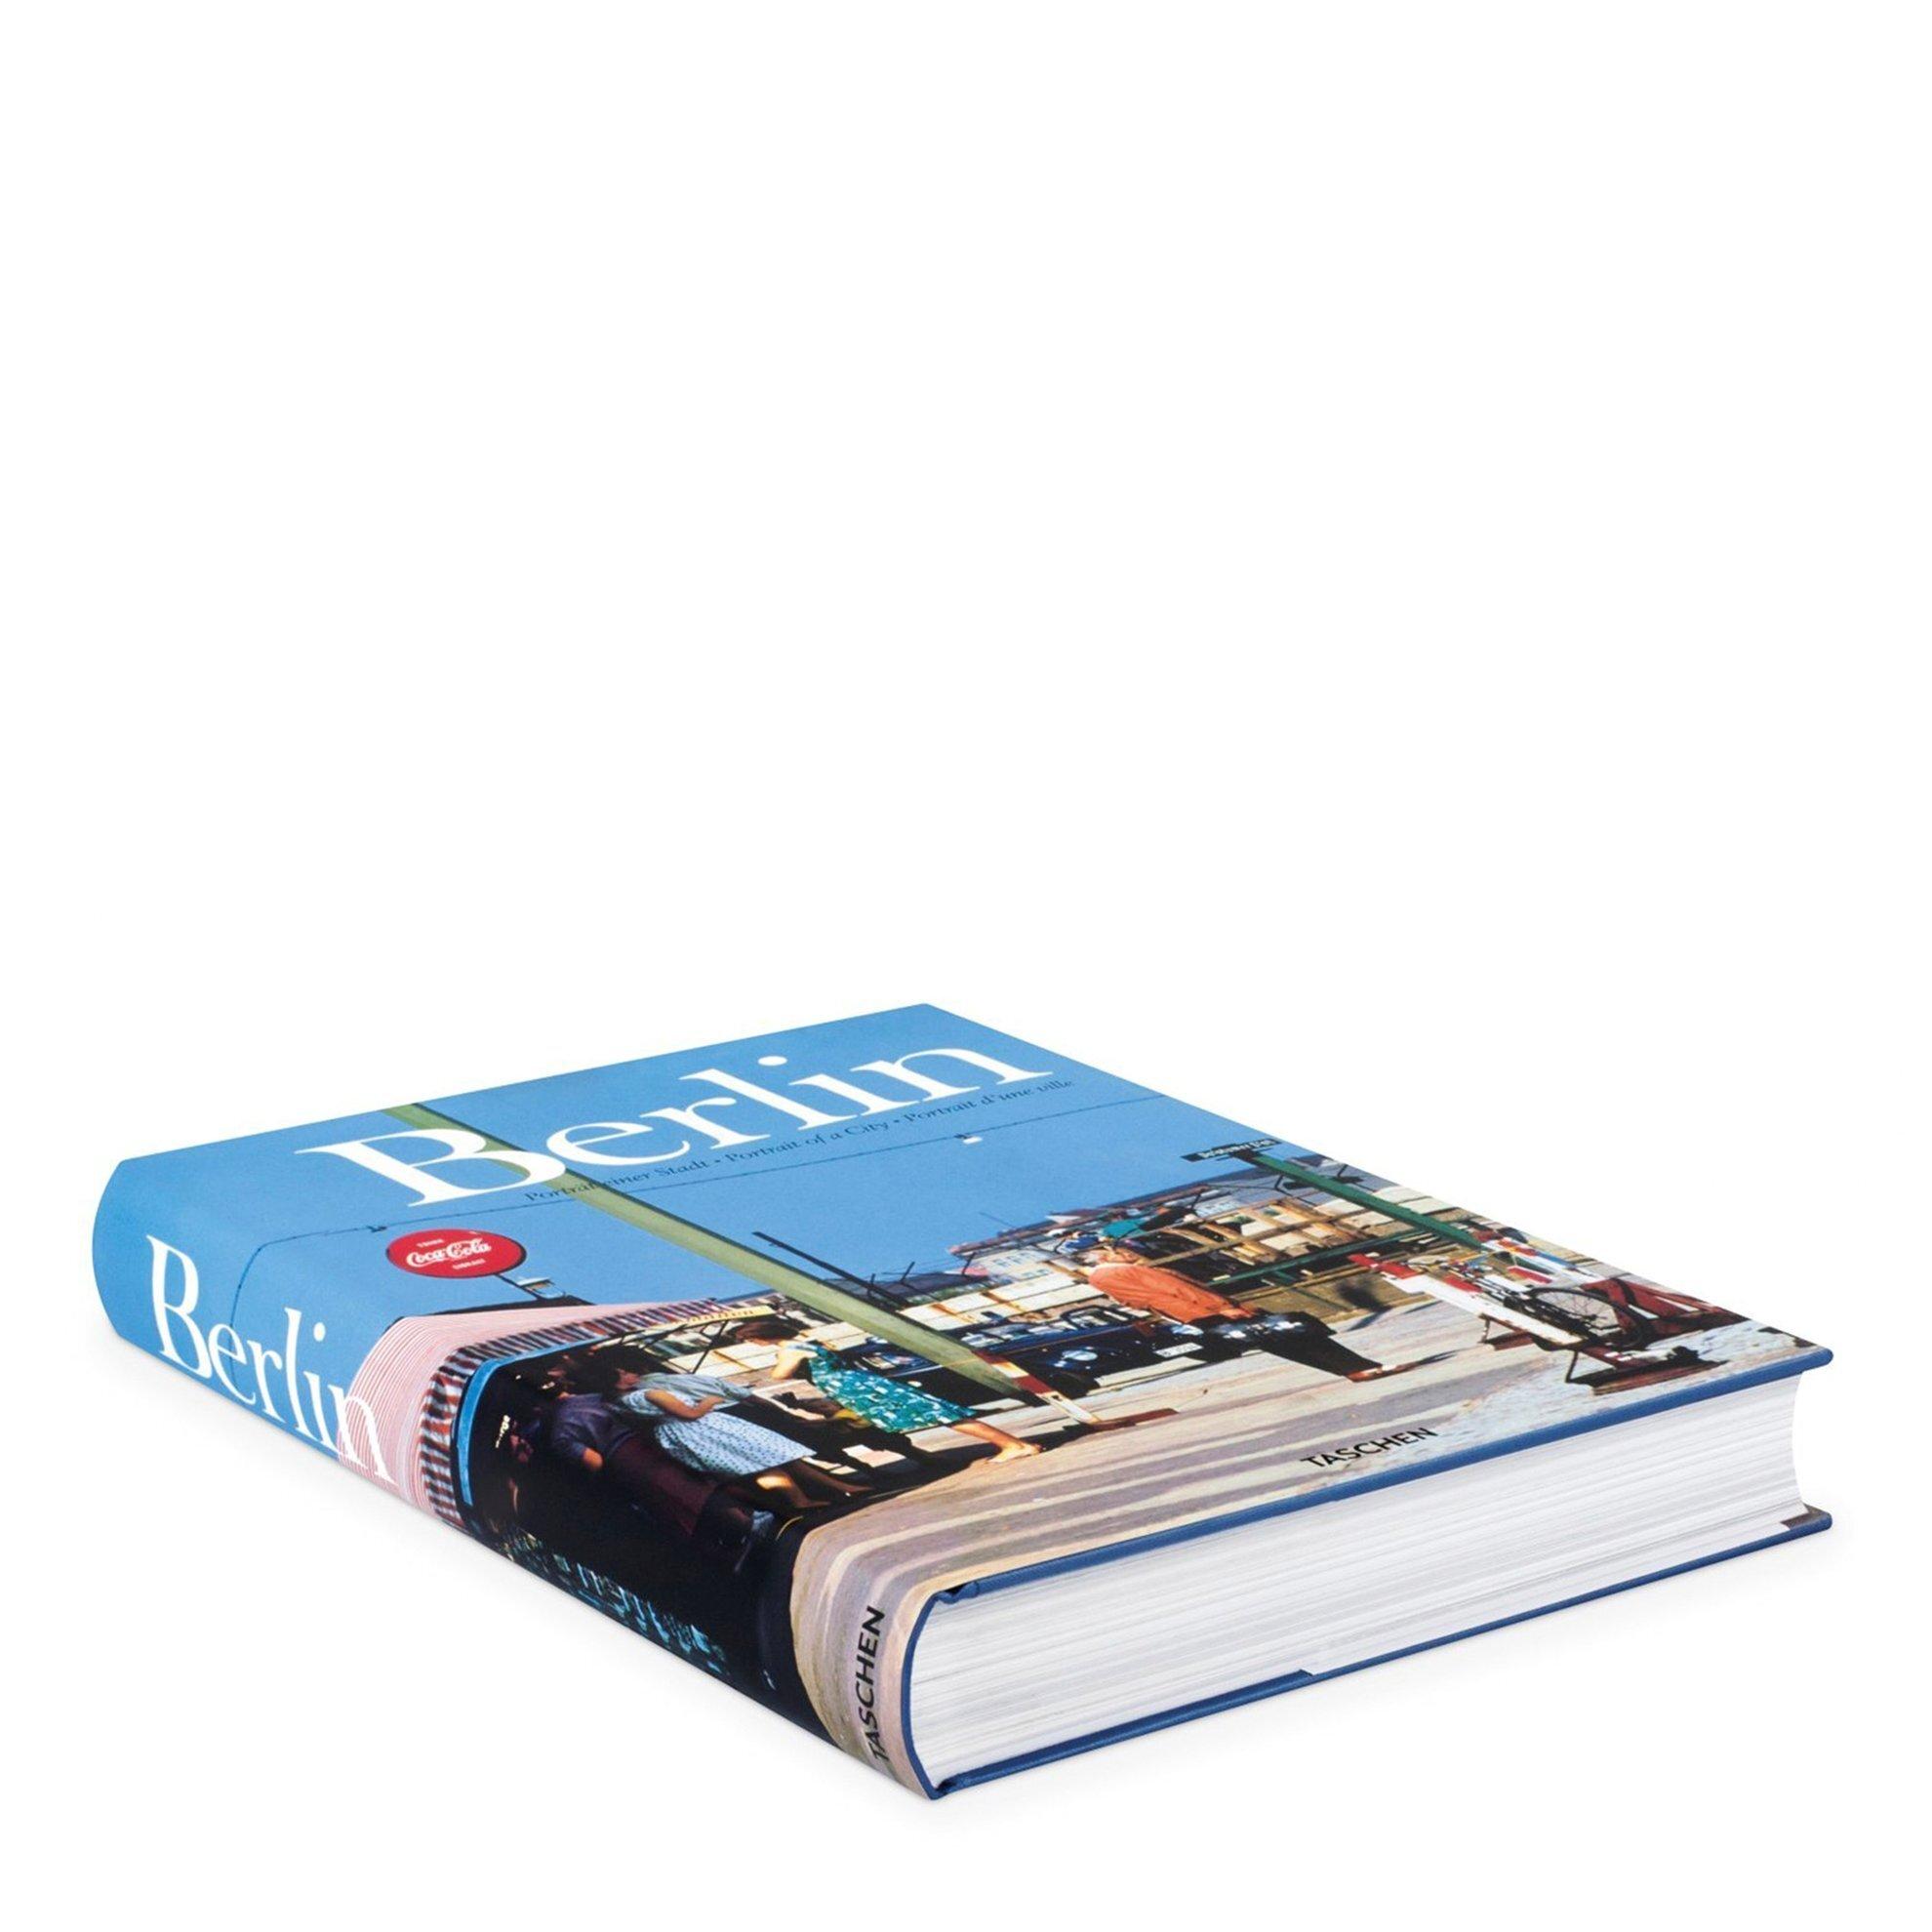 resm Kitap - Berlın, Potraıt Of A Cıty